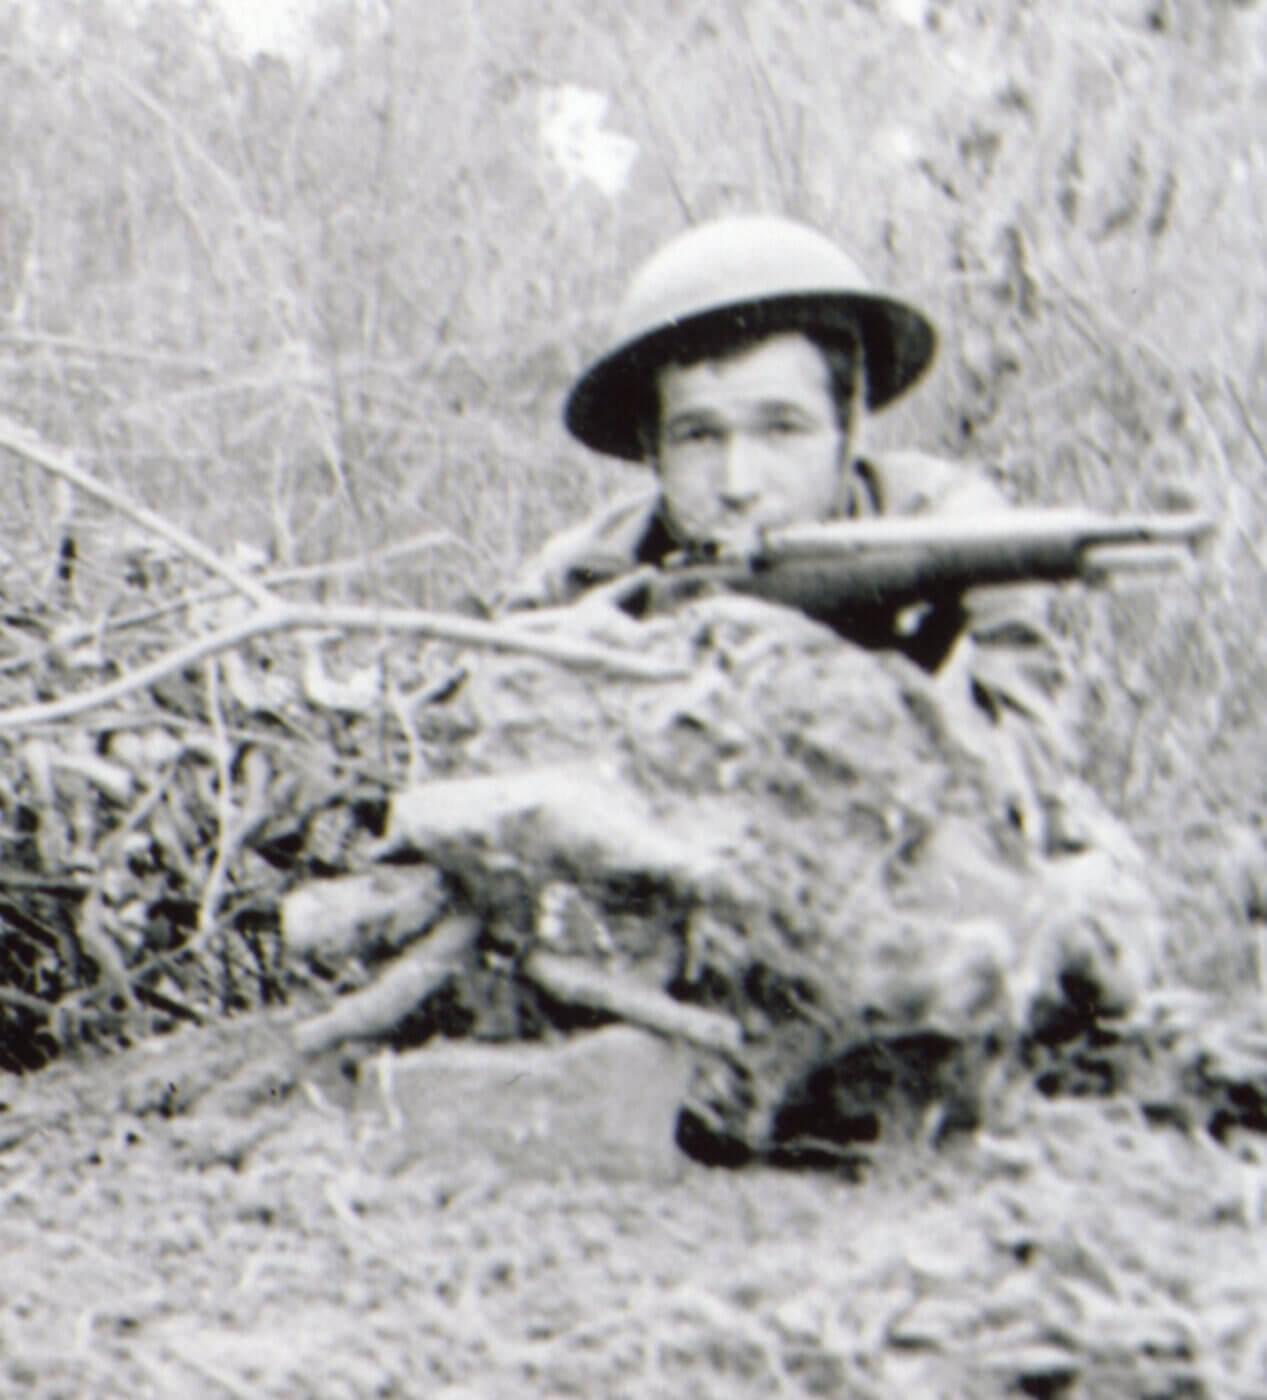 M1 Garand in action at Bataan